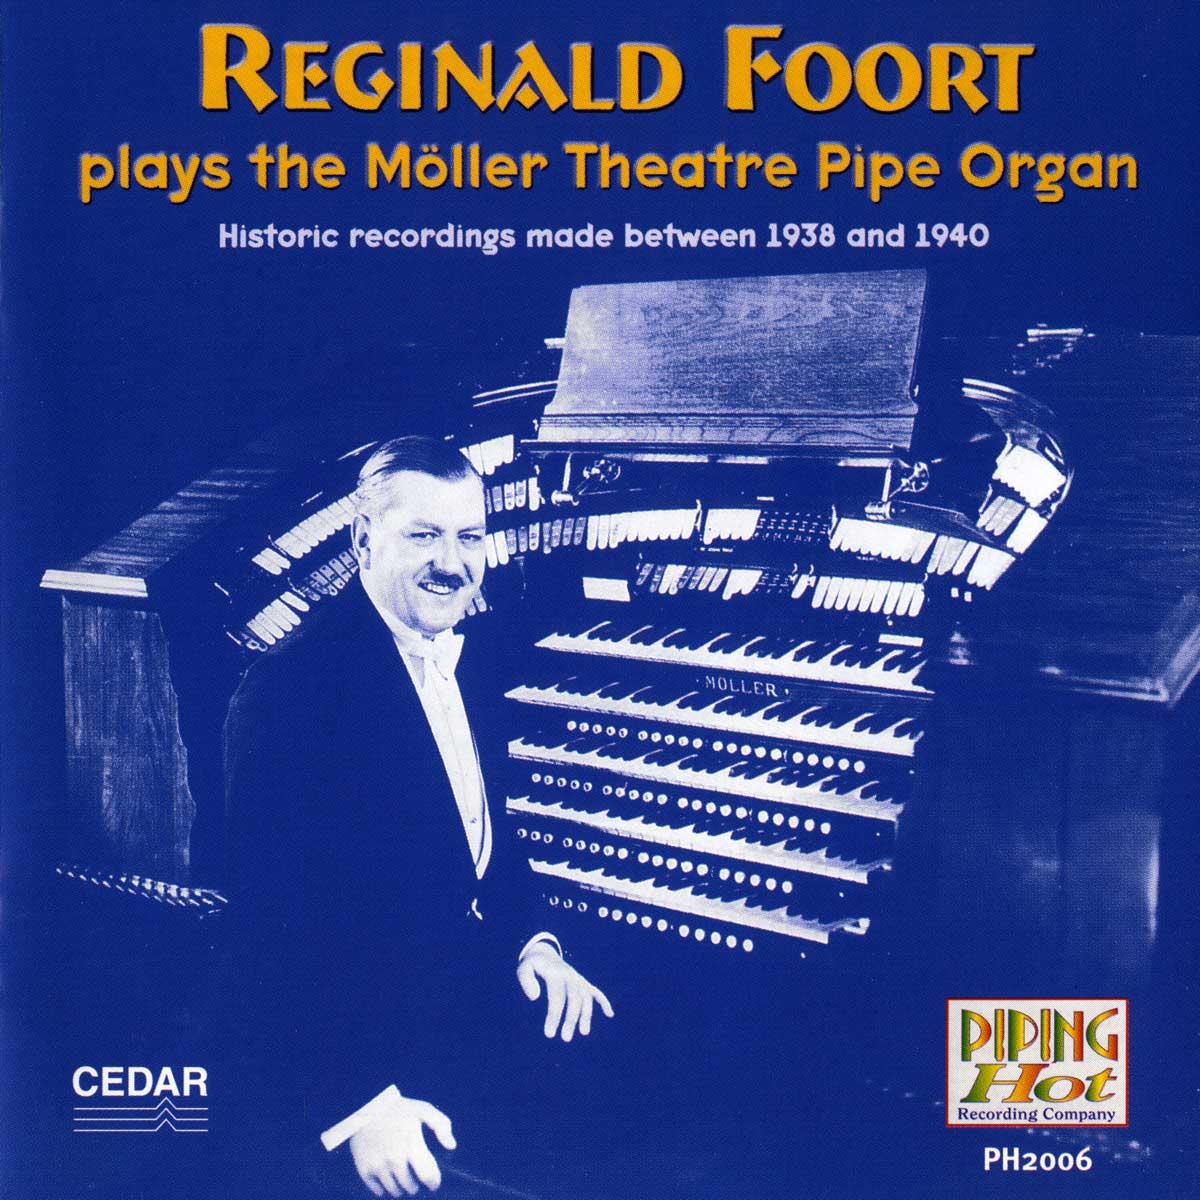 Reginald Foort - Plays the Moller Theatre Pipe Organ